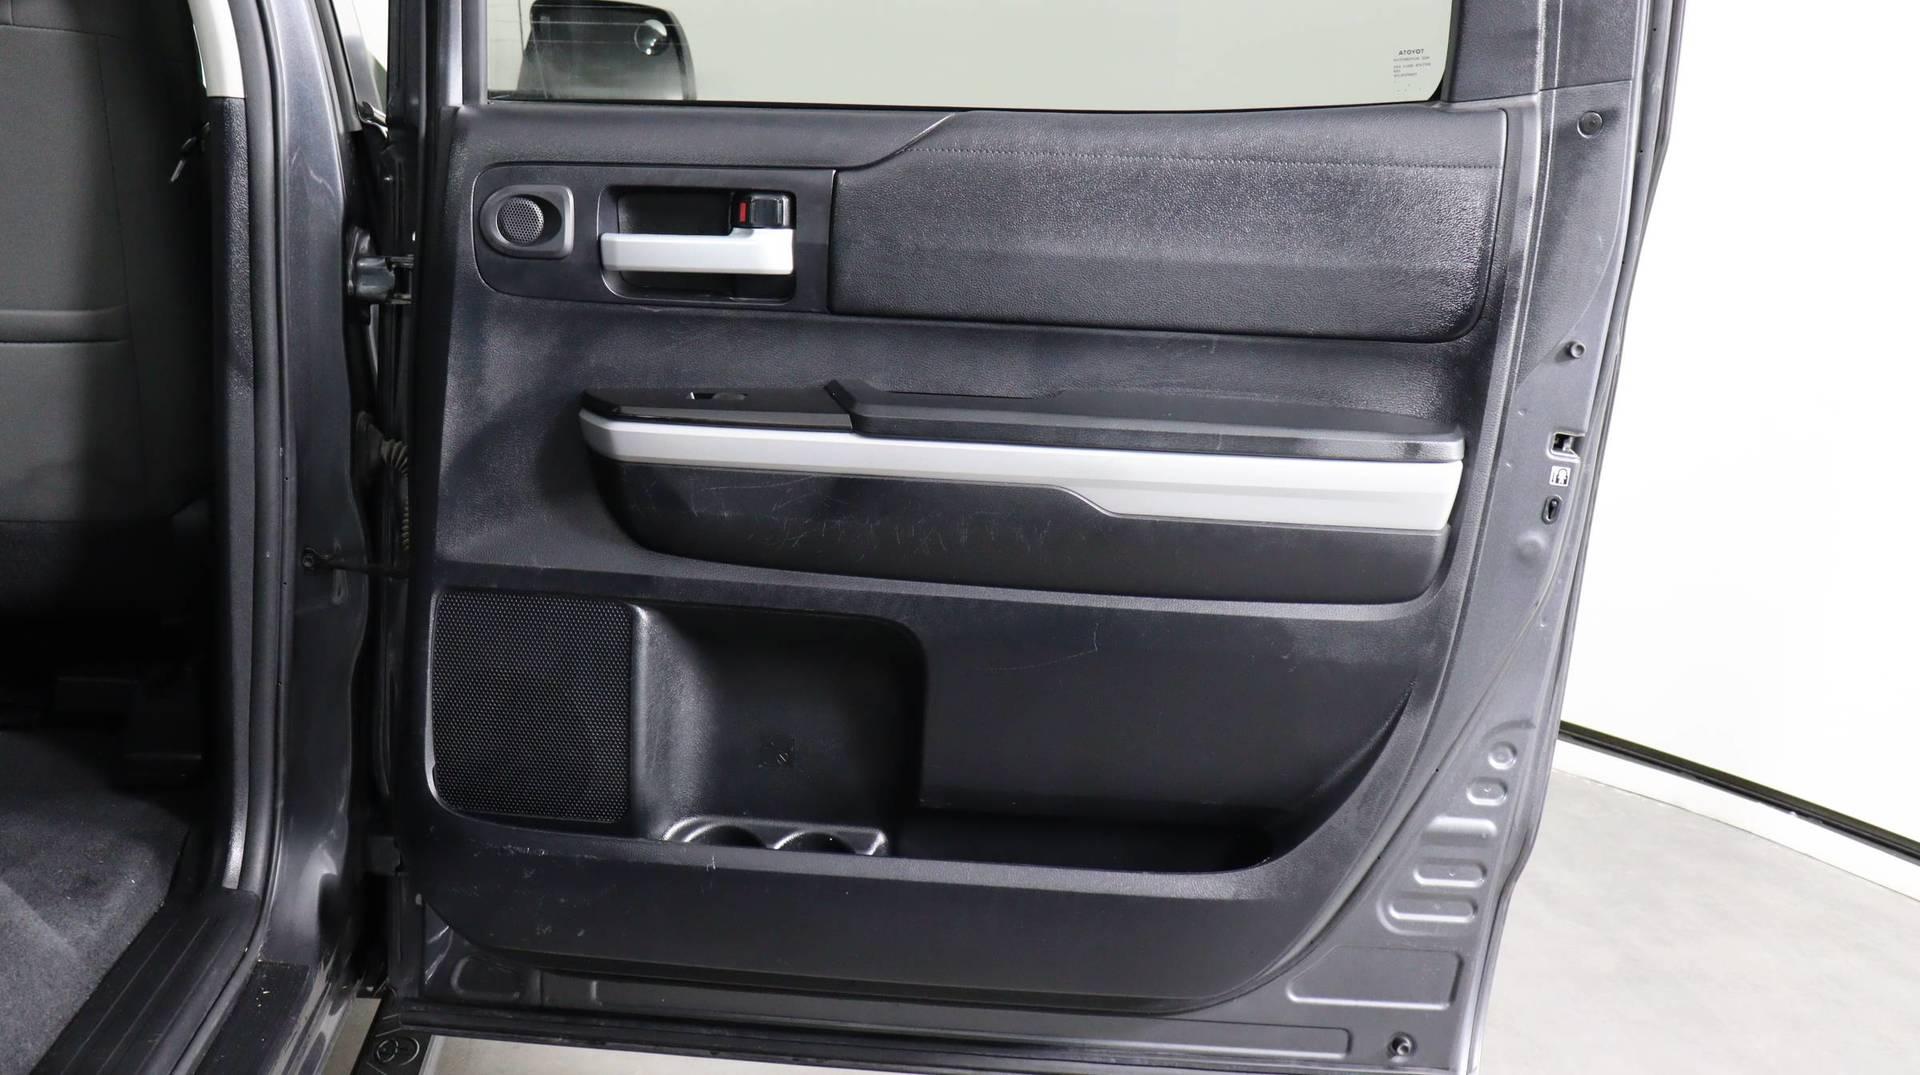 Carvix - Used vehicle - Truck TOYOTA TUNDRA 2WD 2018